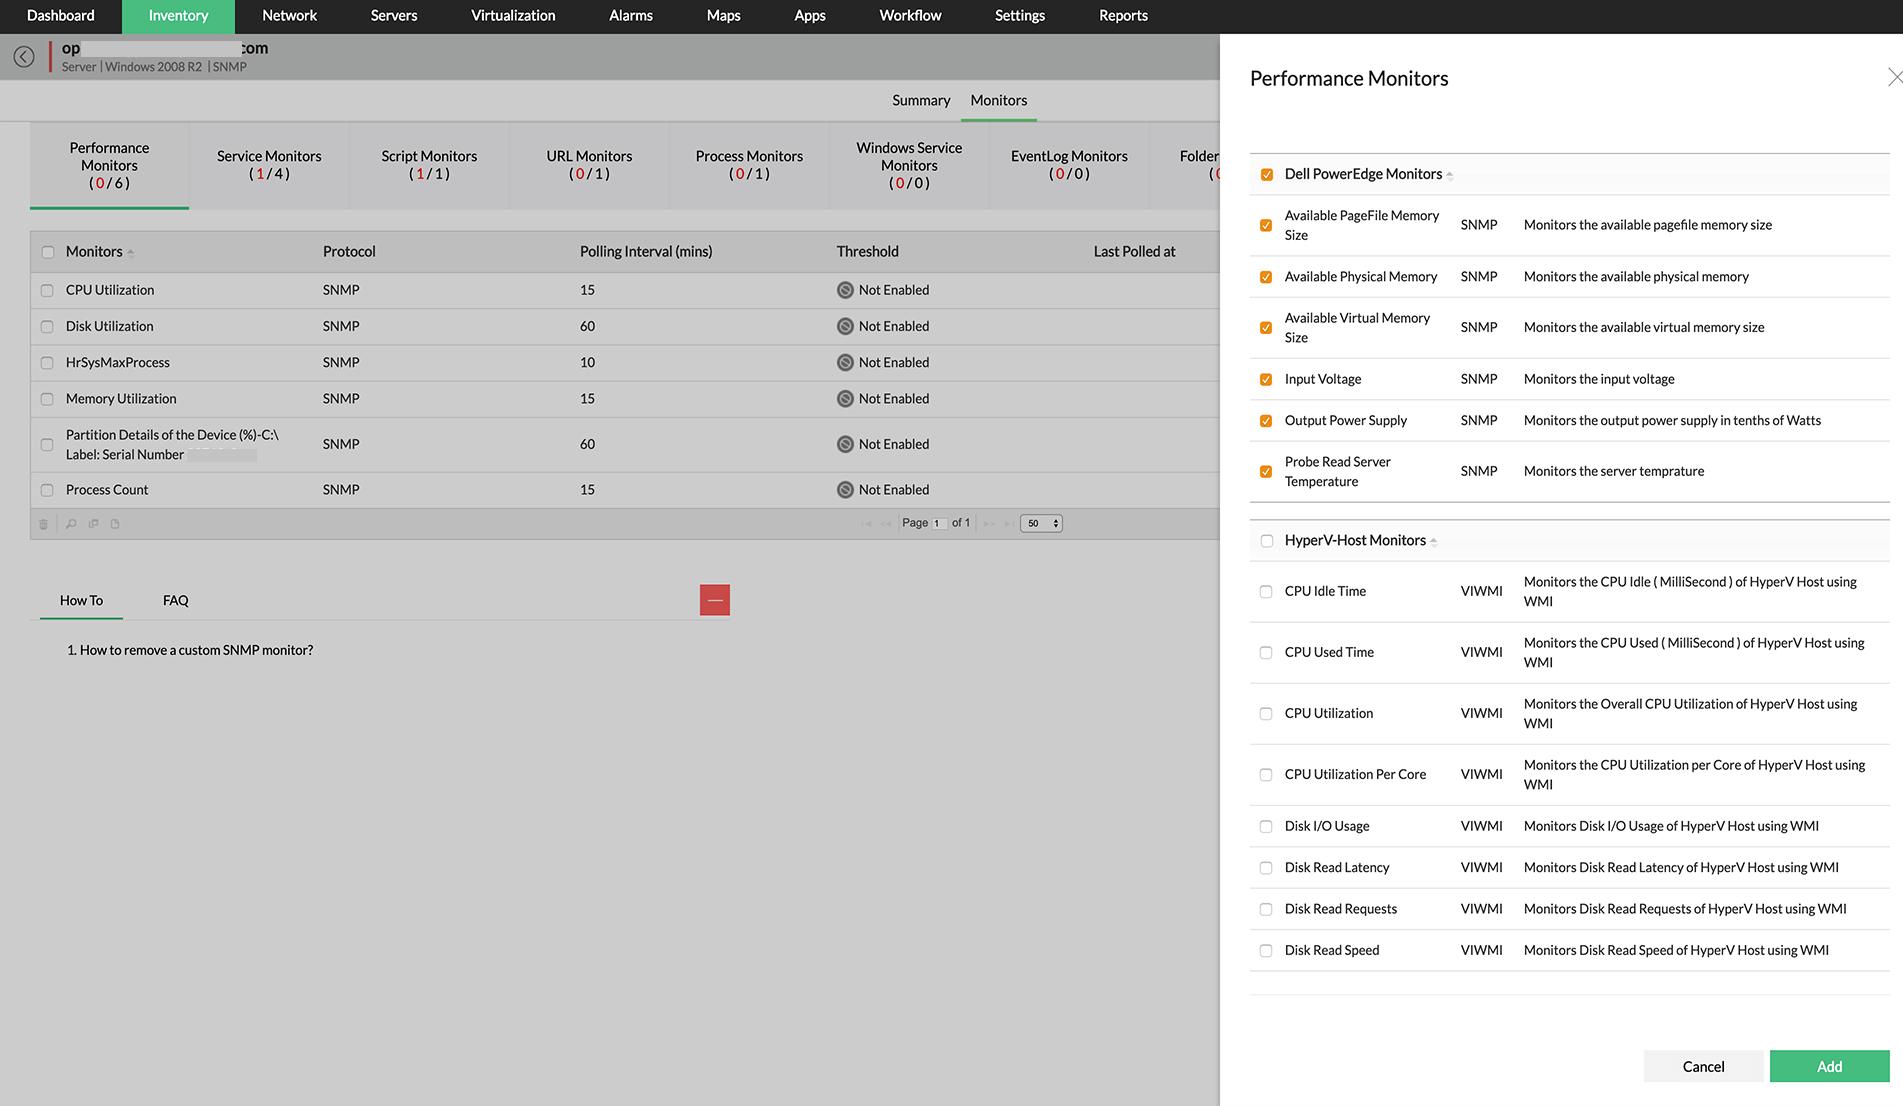 CPU Memory & Disk Utilization Performance Monitor